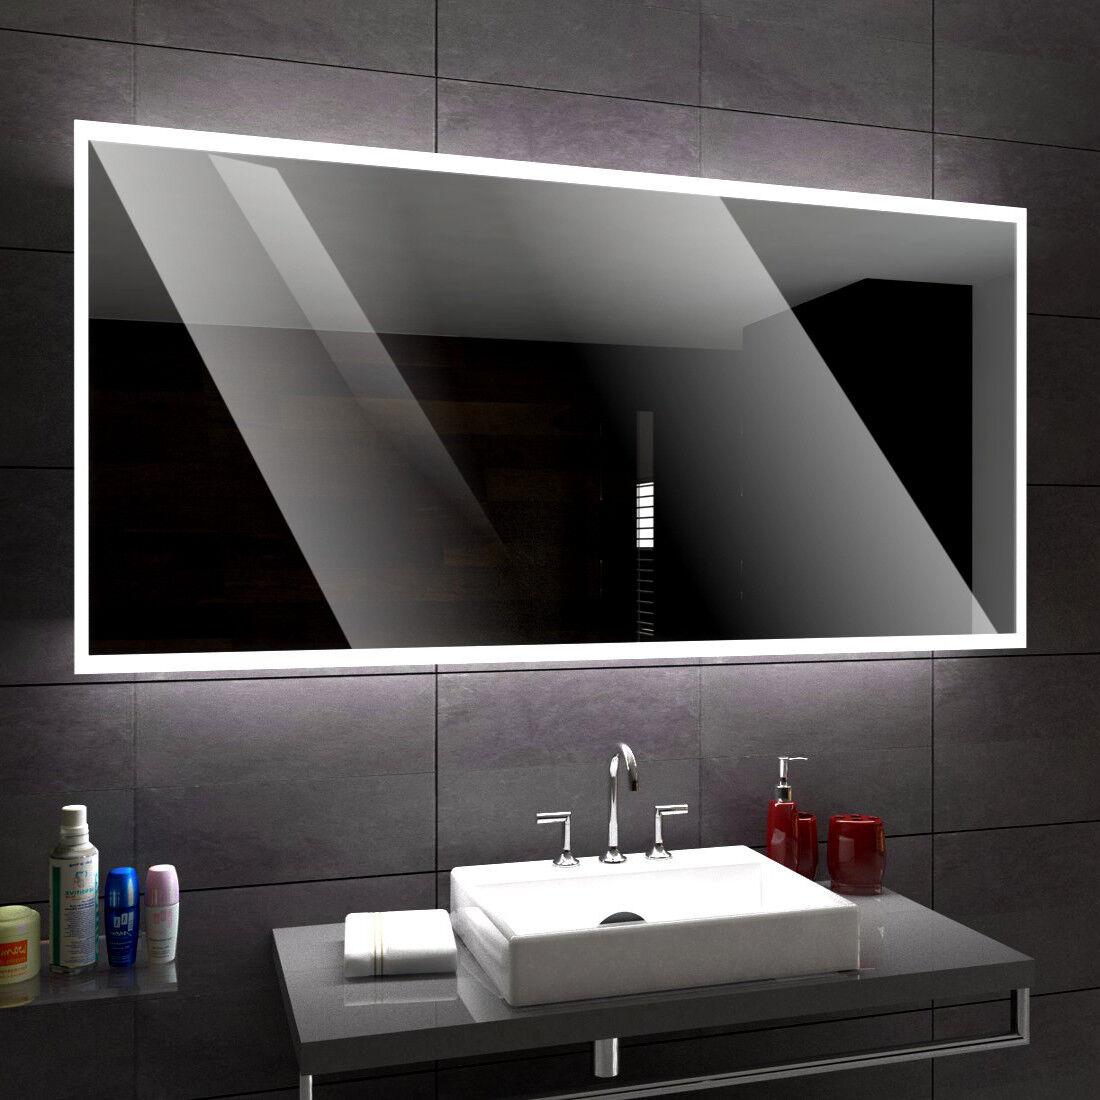 Boston Salle de Bain LED Illumination sur mesure éclairage F01